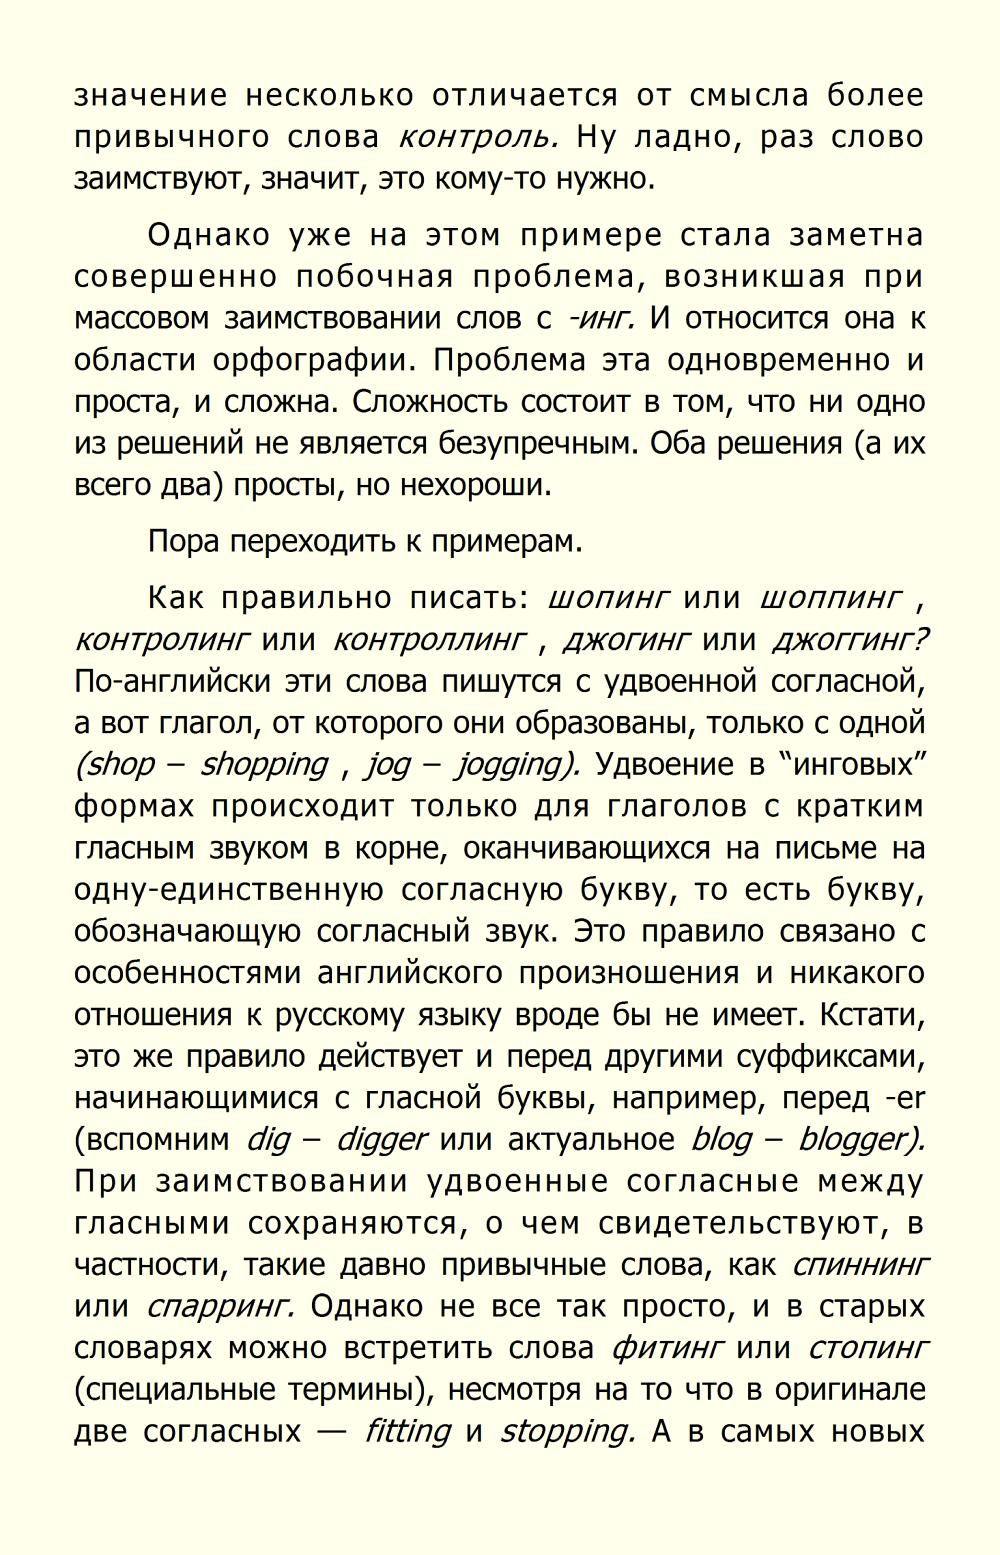 http://i4.imageban.ru/out/2013/11/27/8b021f3aa9dcdc0c9c8d9baf789f7323.jpg